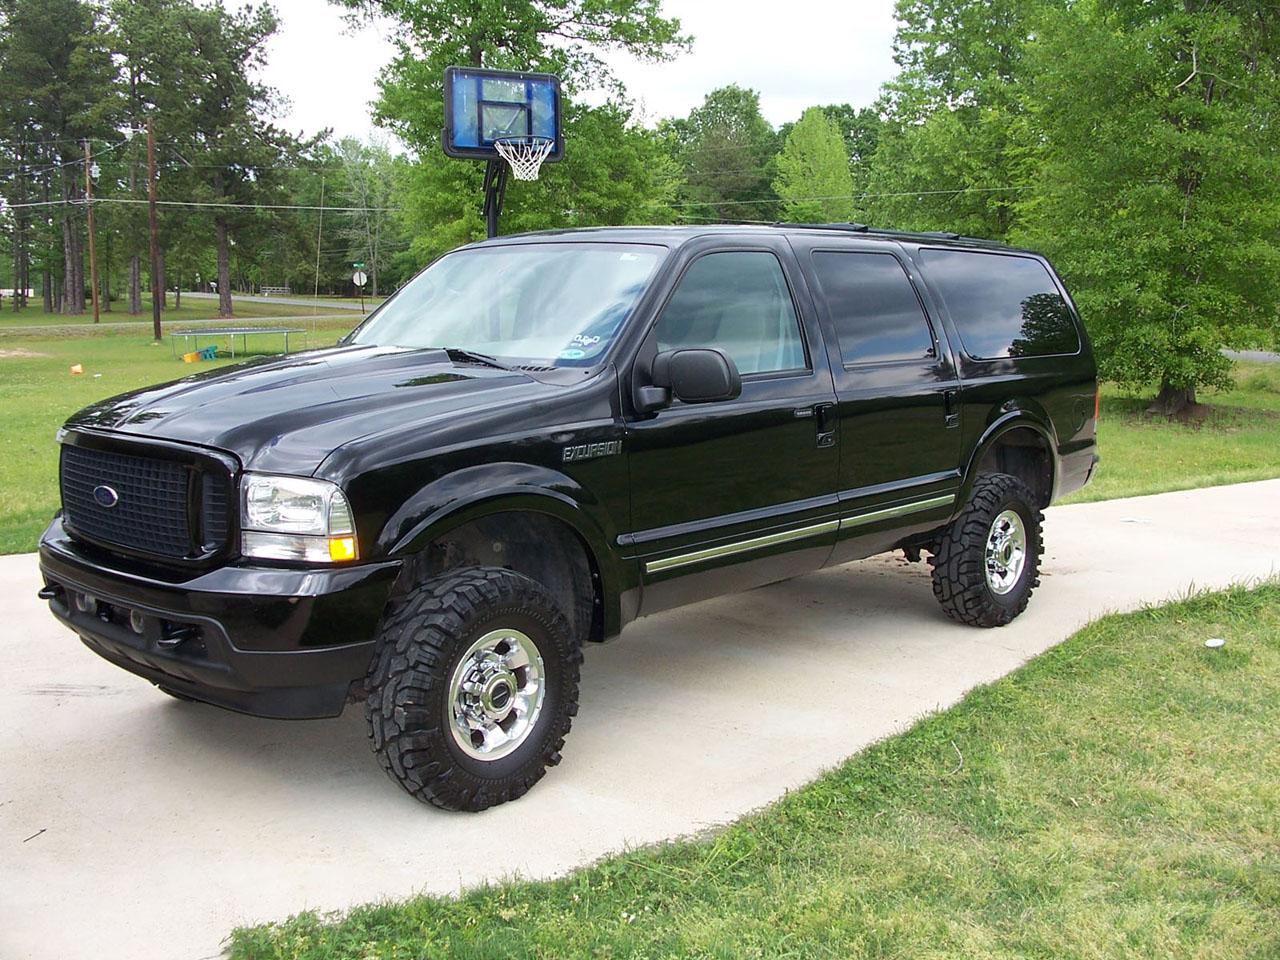 Ford Excursion (Форд Экскуршн) - Продажа, Цены, Отзывы, Фото .